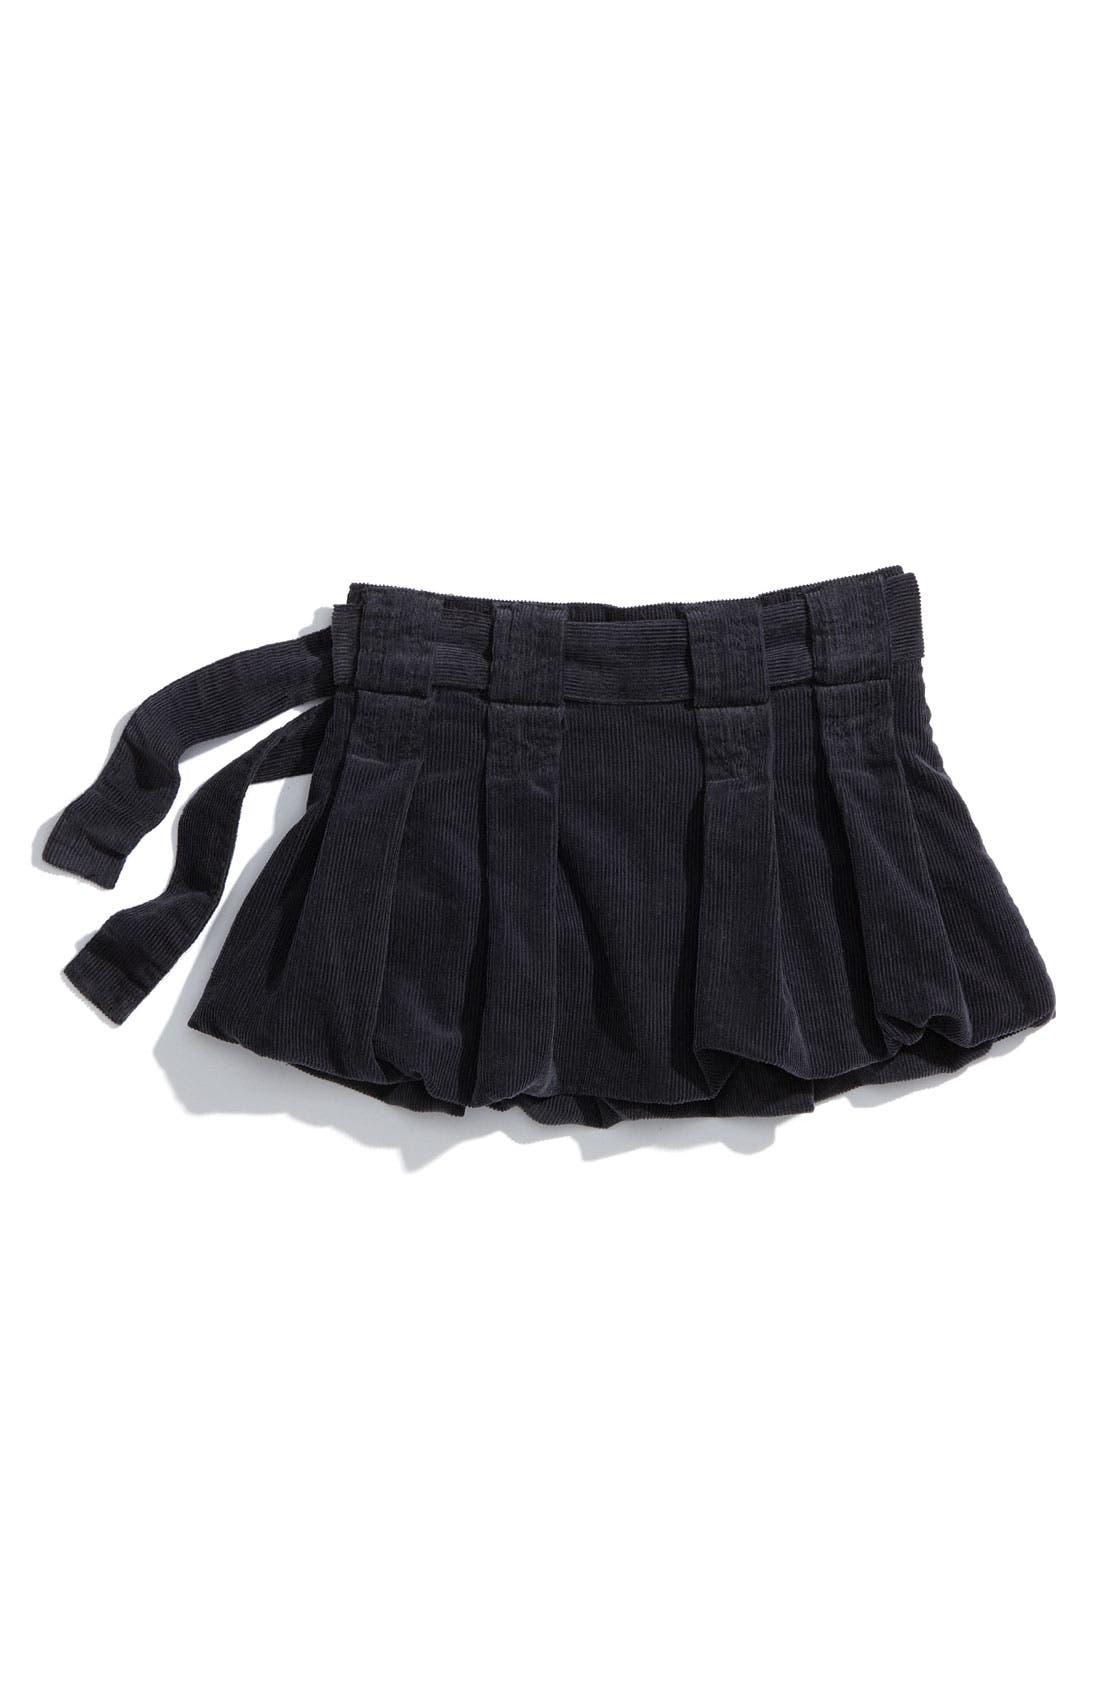 Alternate Image 1 Selected - United Colors of Benetton Kids Corduroy Skirt (Toddler)